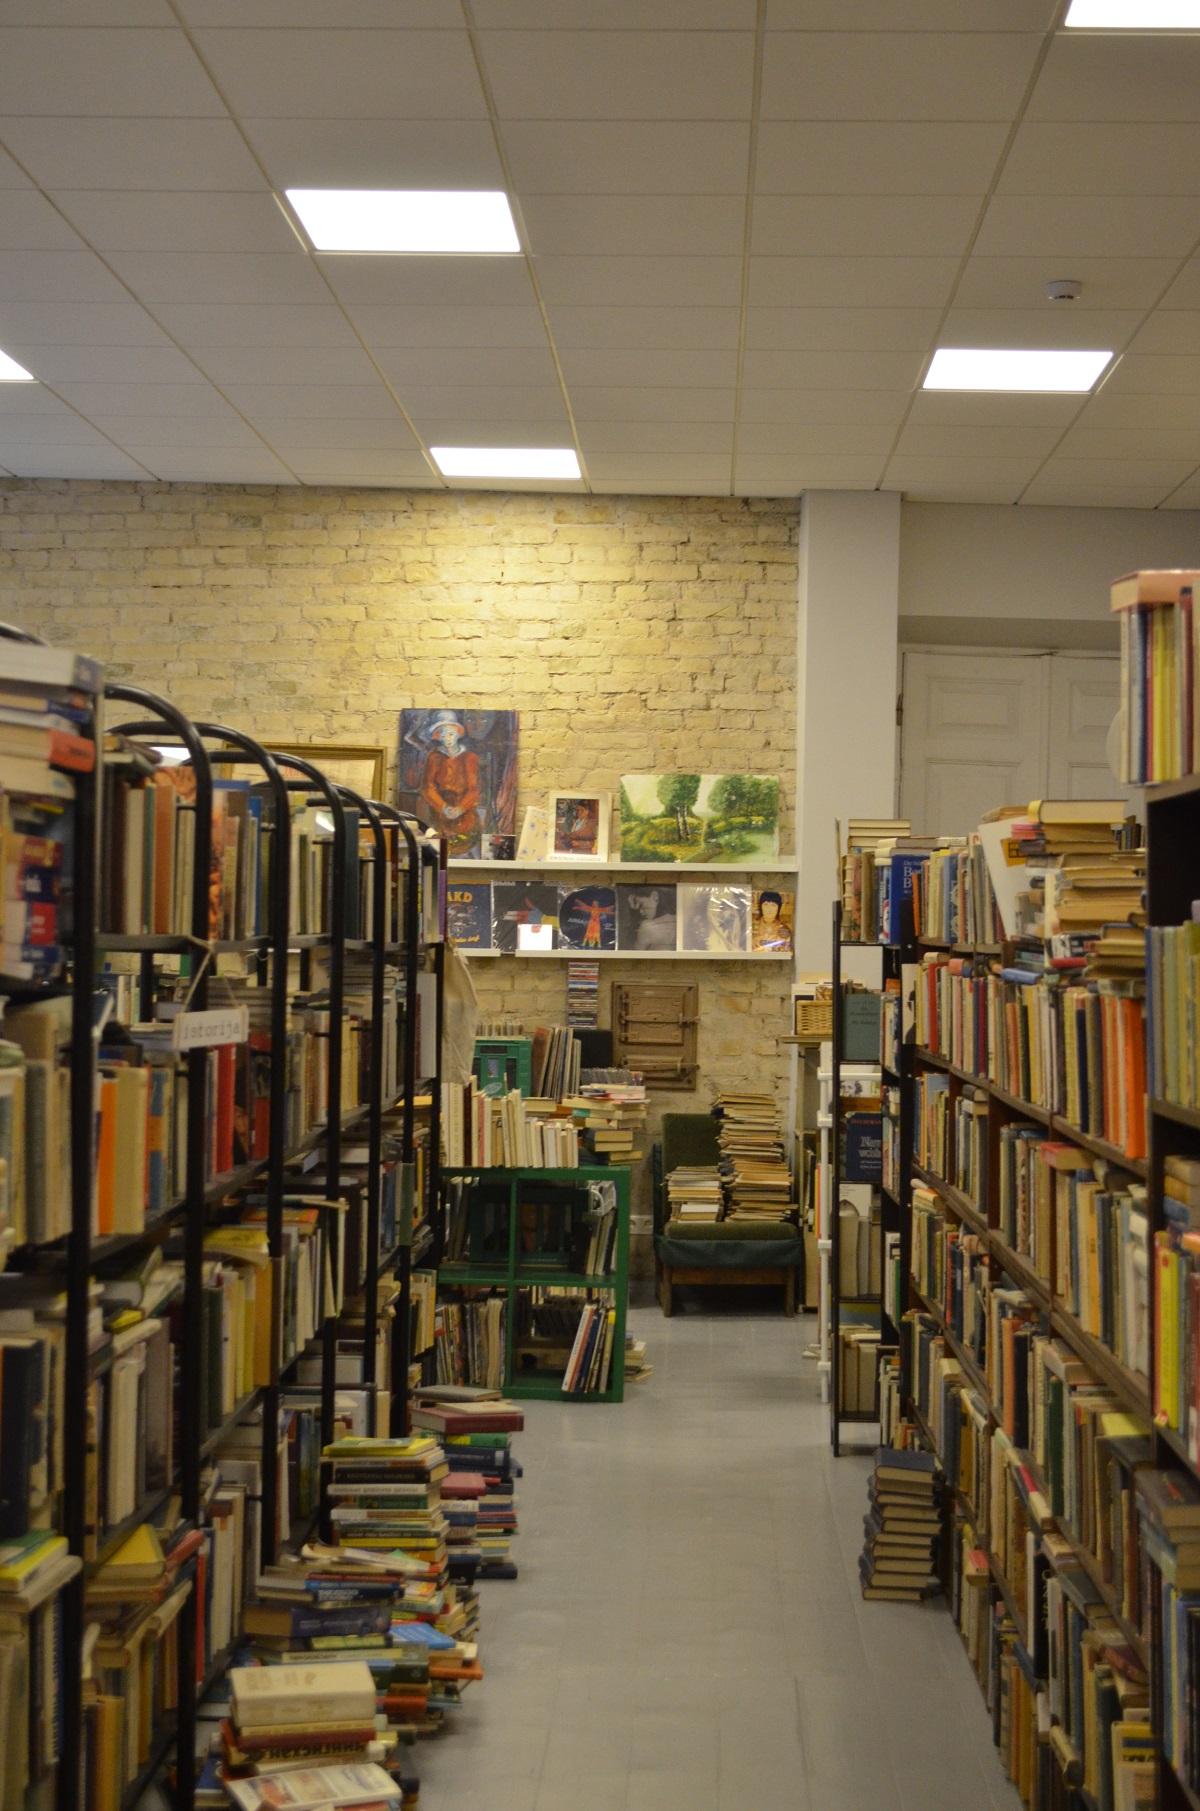 Knygų lentynos.